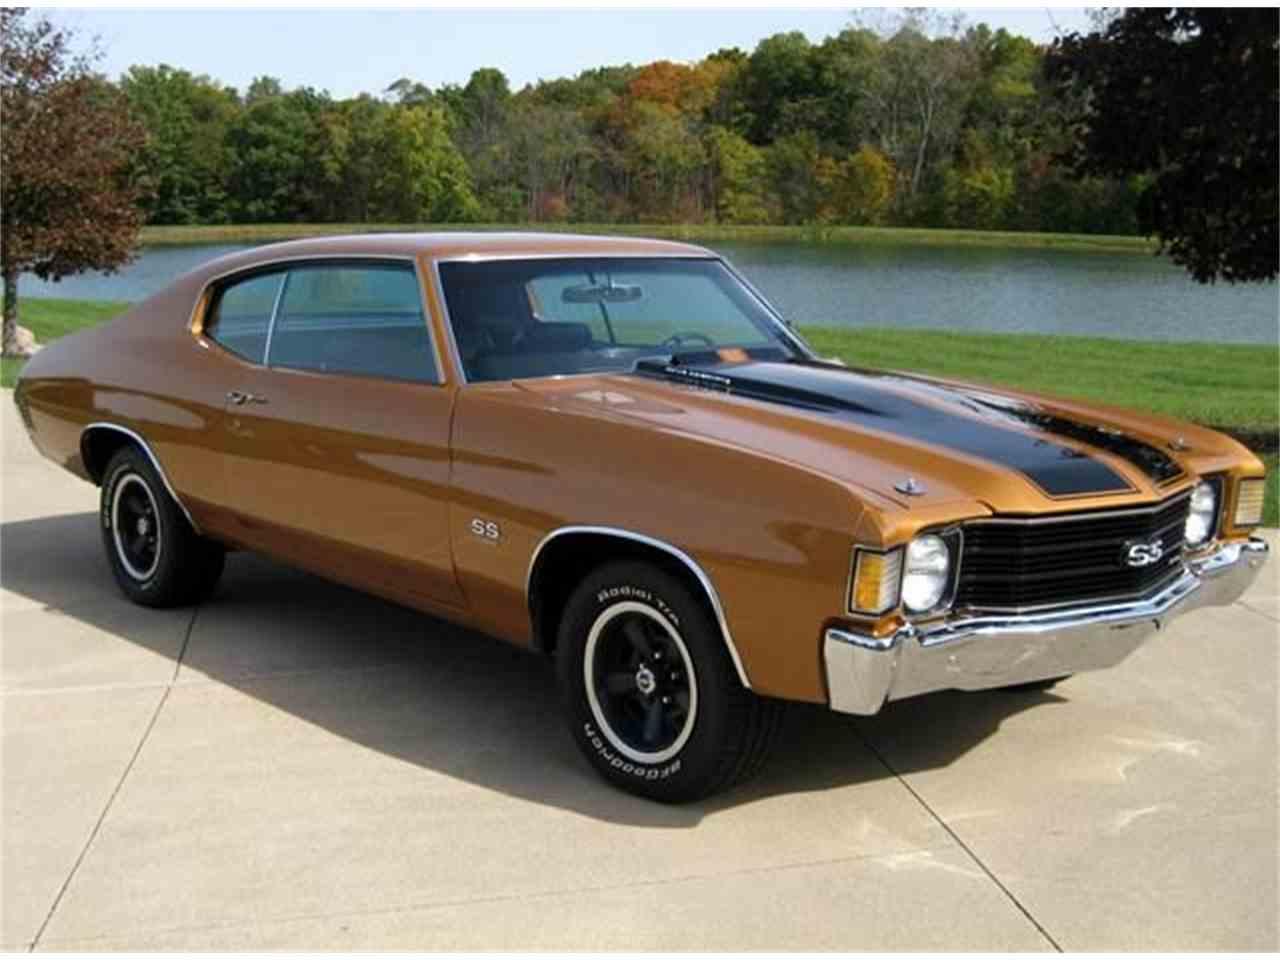 1972 Chevrolet Chevelle SS for Sale - CC-599326